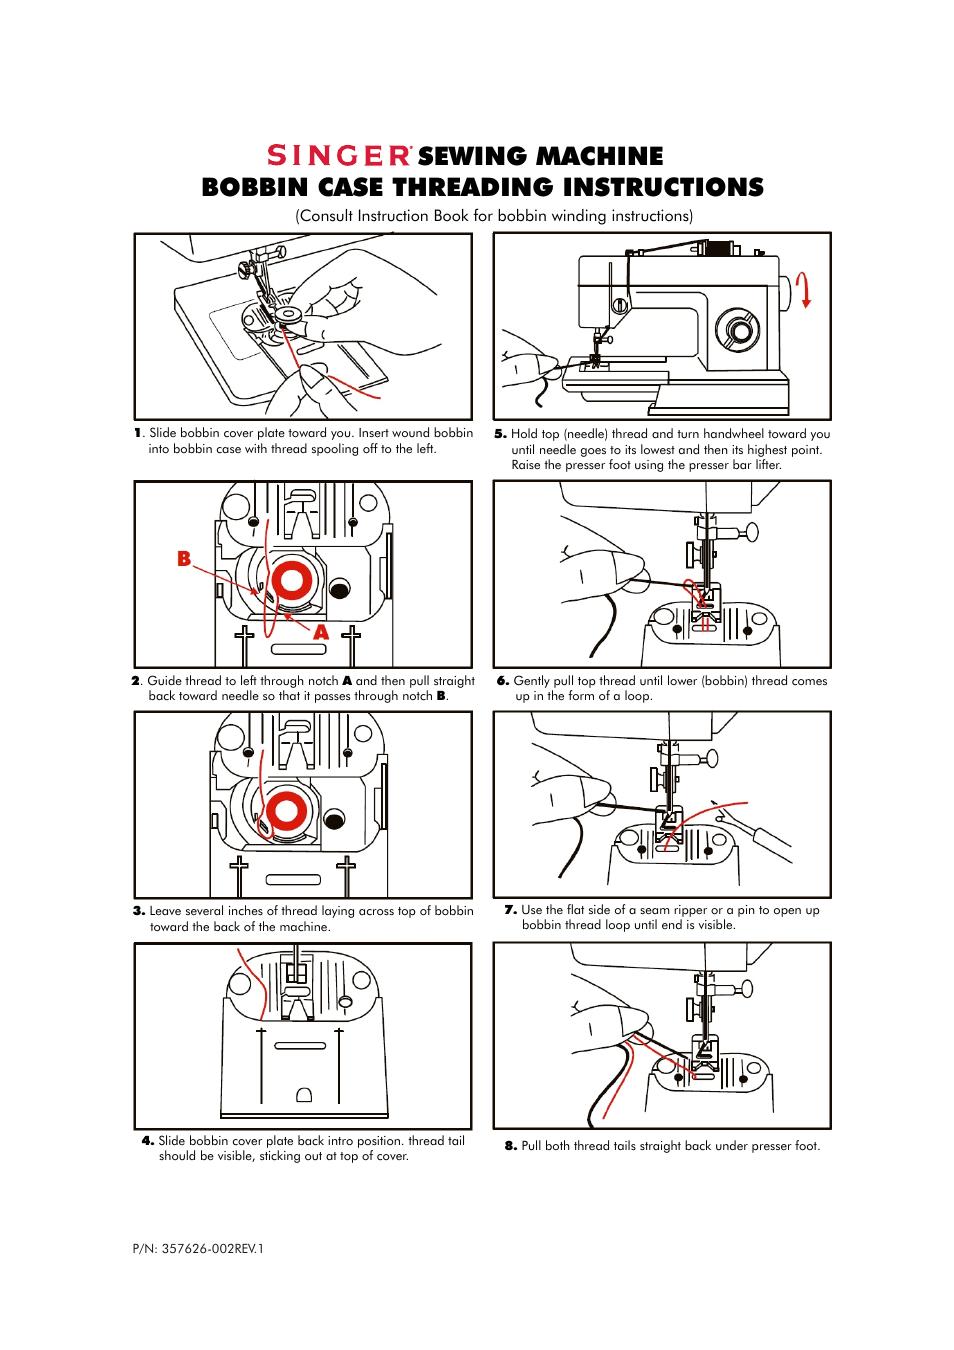 SINGER P-1250 PROFESSIONAL Quick-Start Guide User Manual